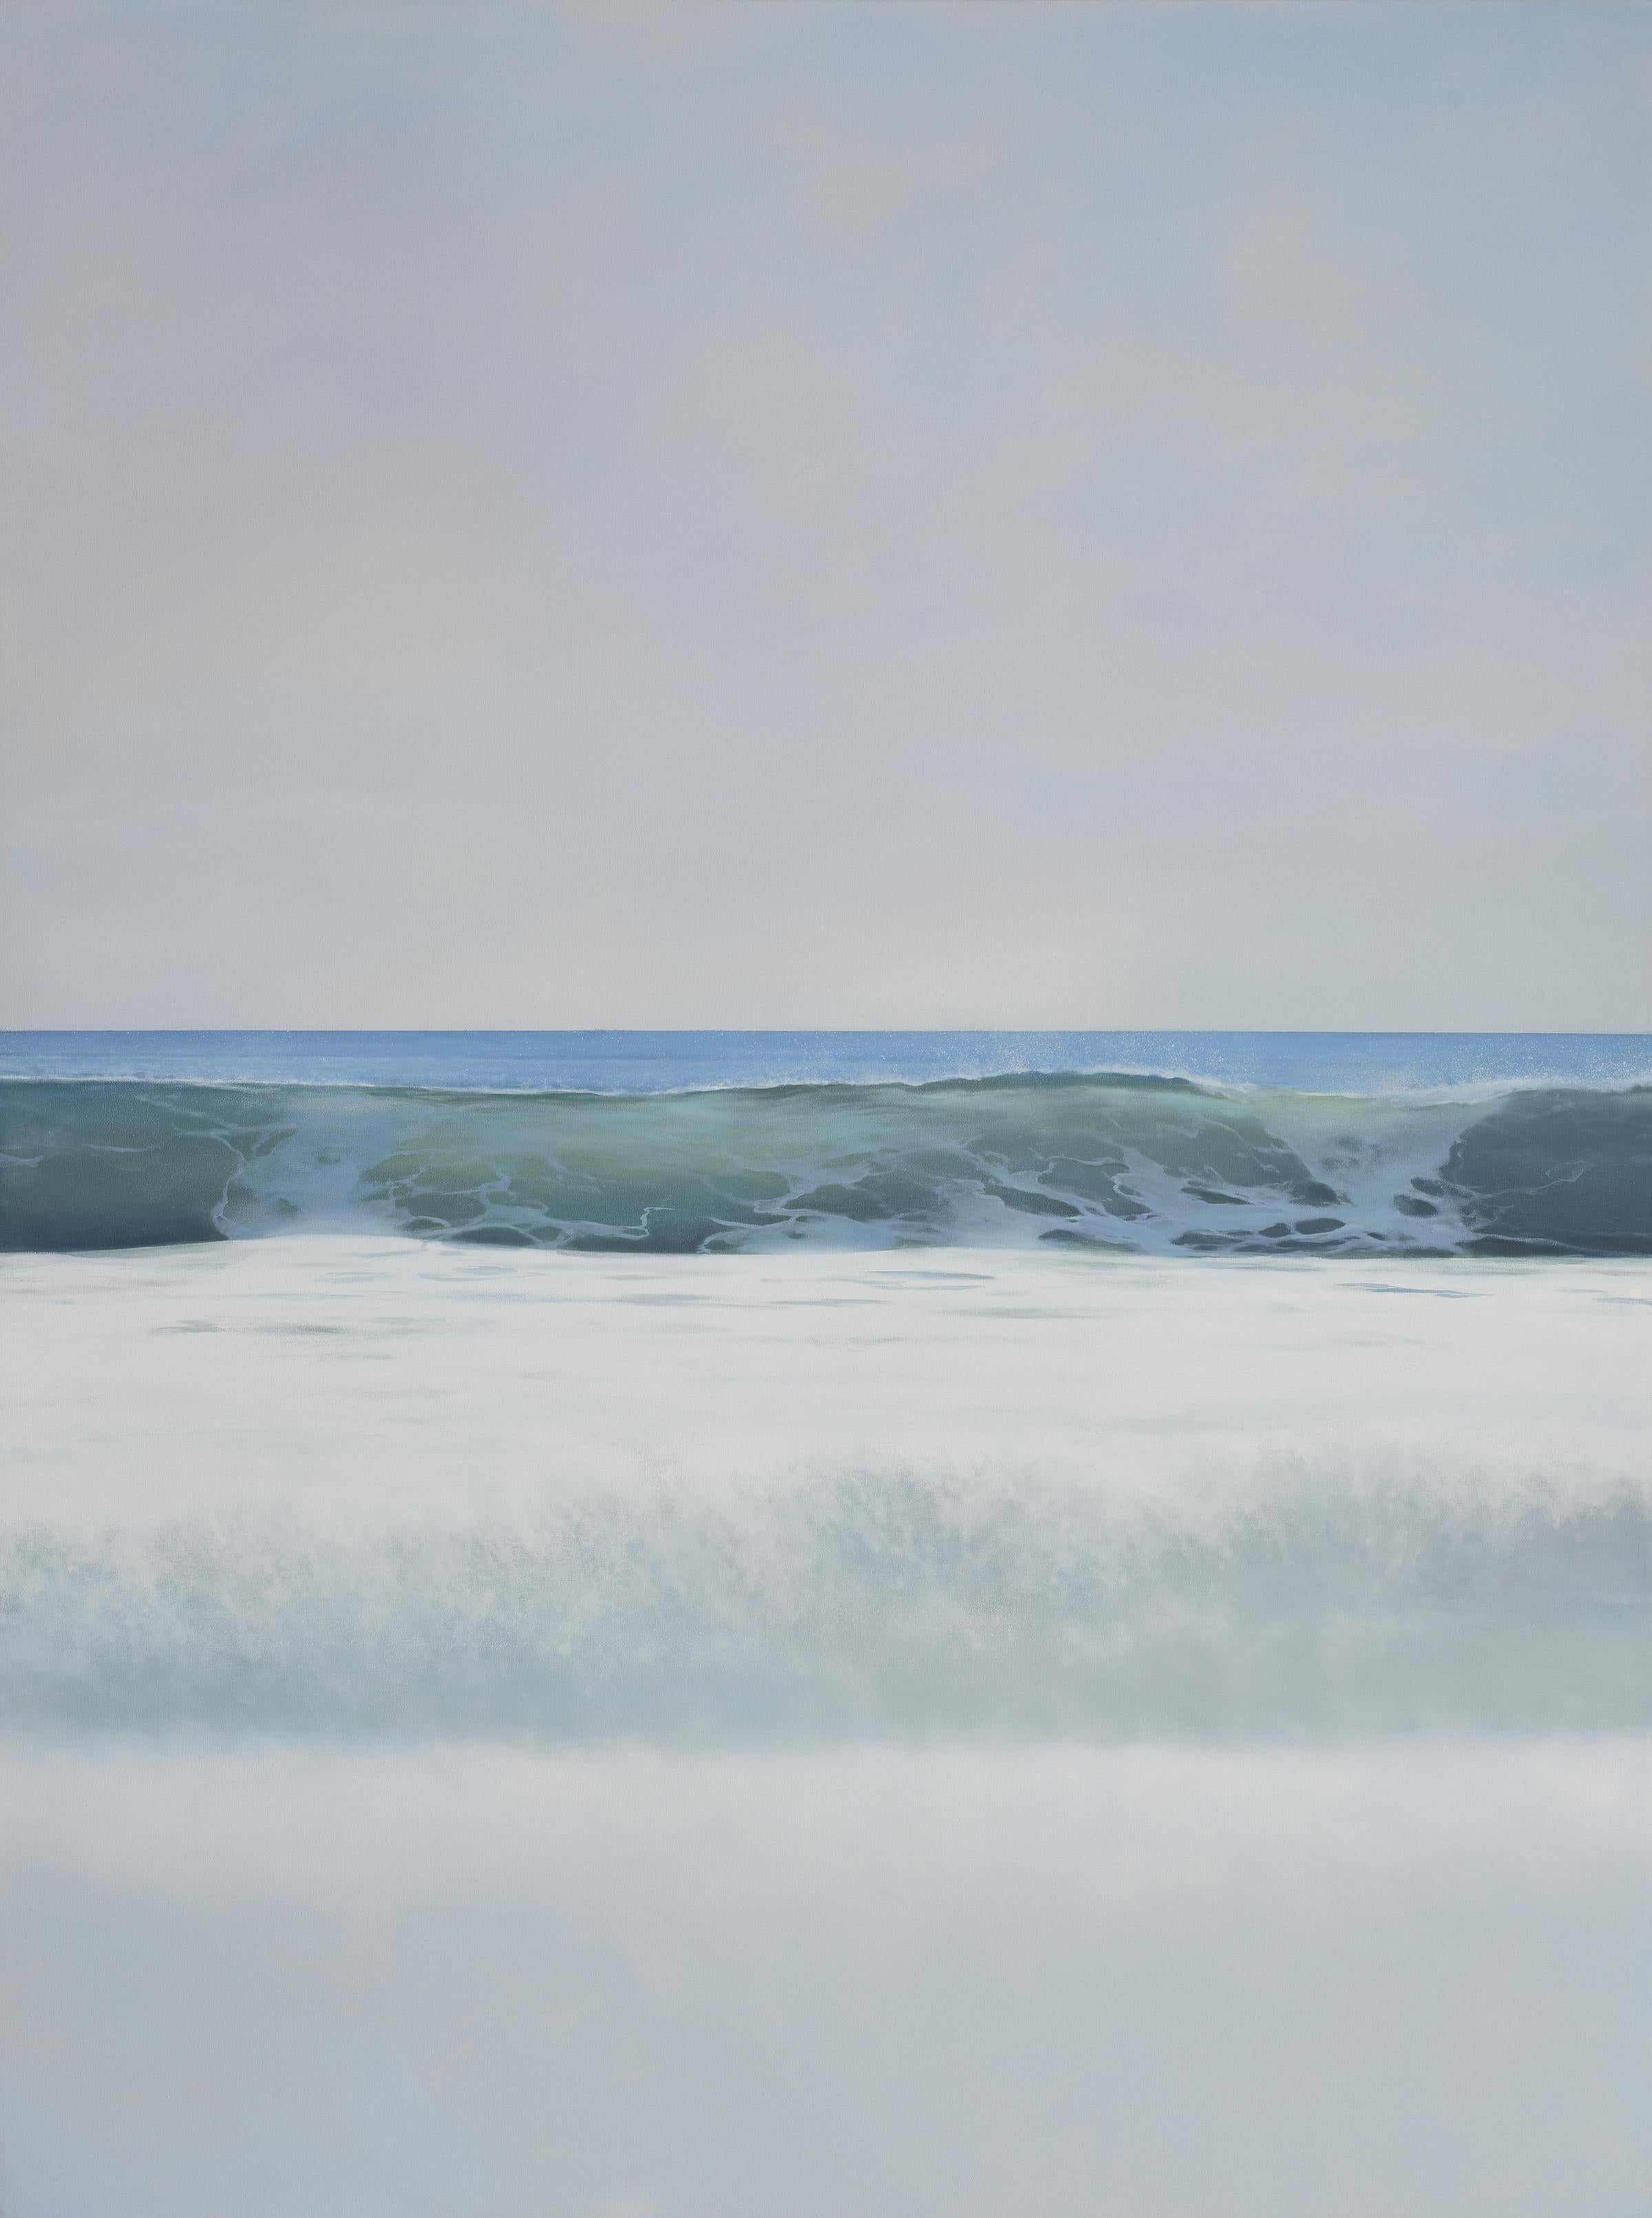 SUMMER WHITES, ocean shoreline, waterscape, shades of white, blue, waves, malibu